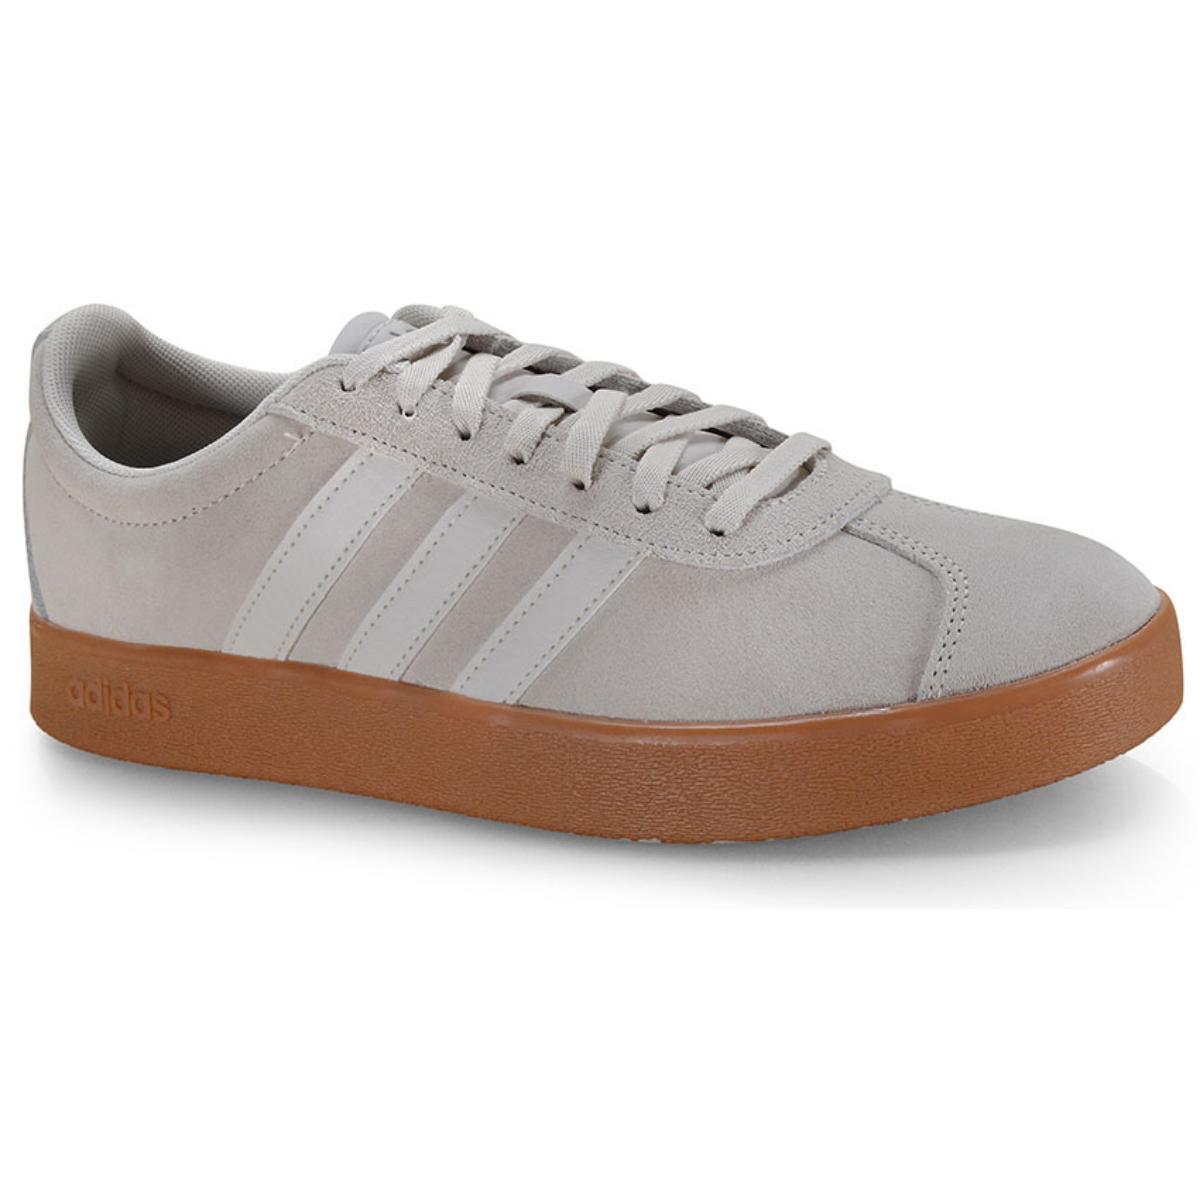 Tênis Masculino Adidas Ee6893 vl Court 20 m Bege/branco